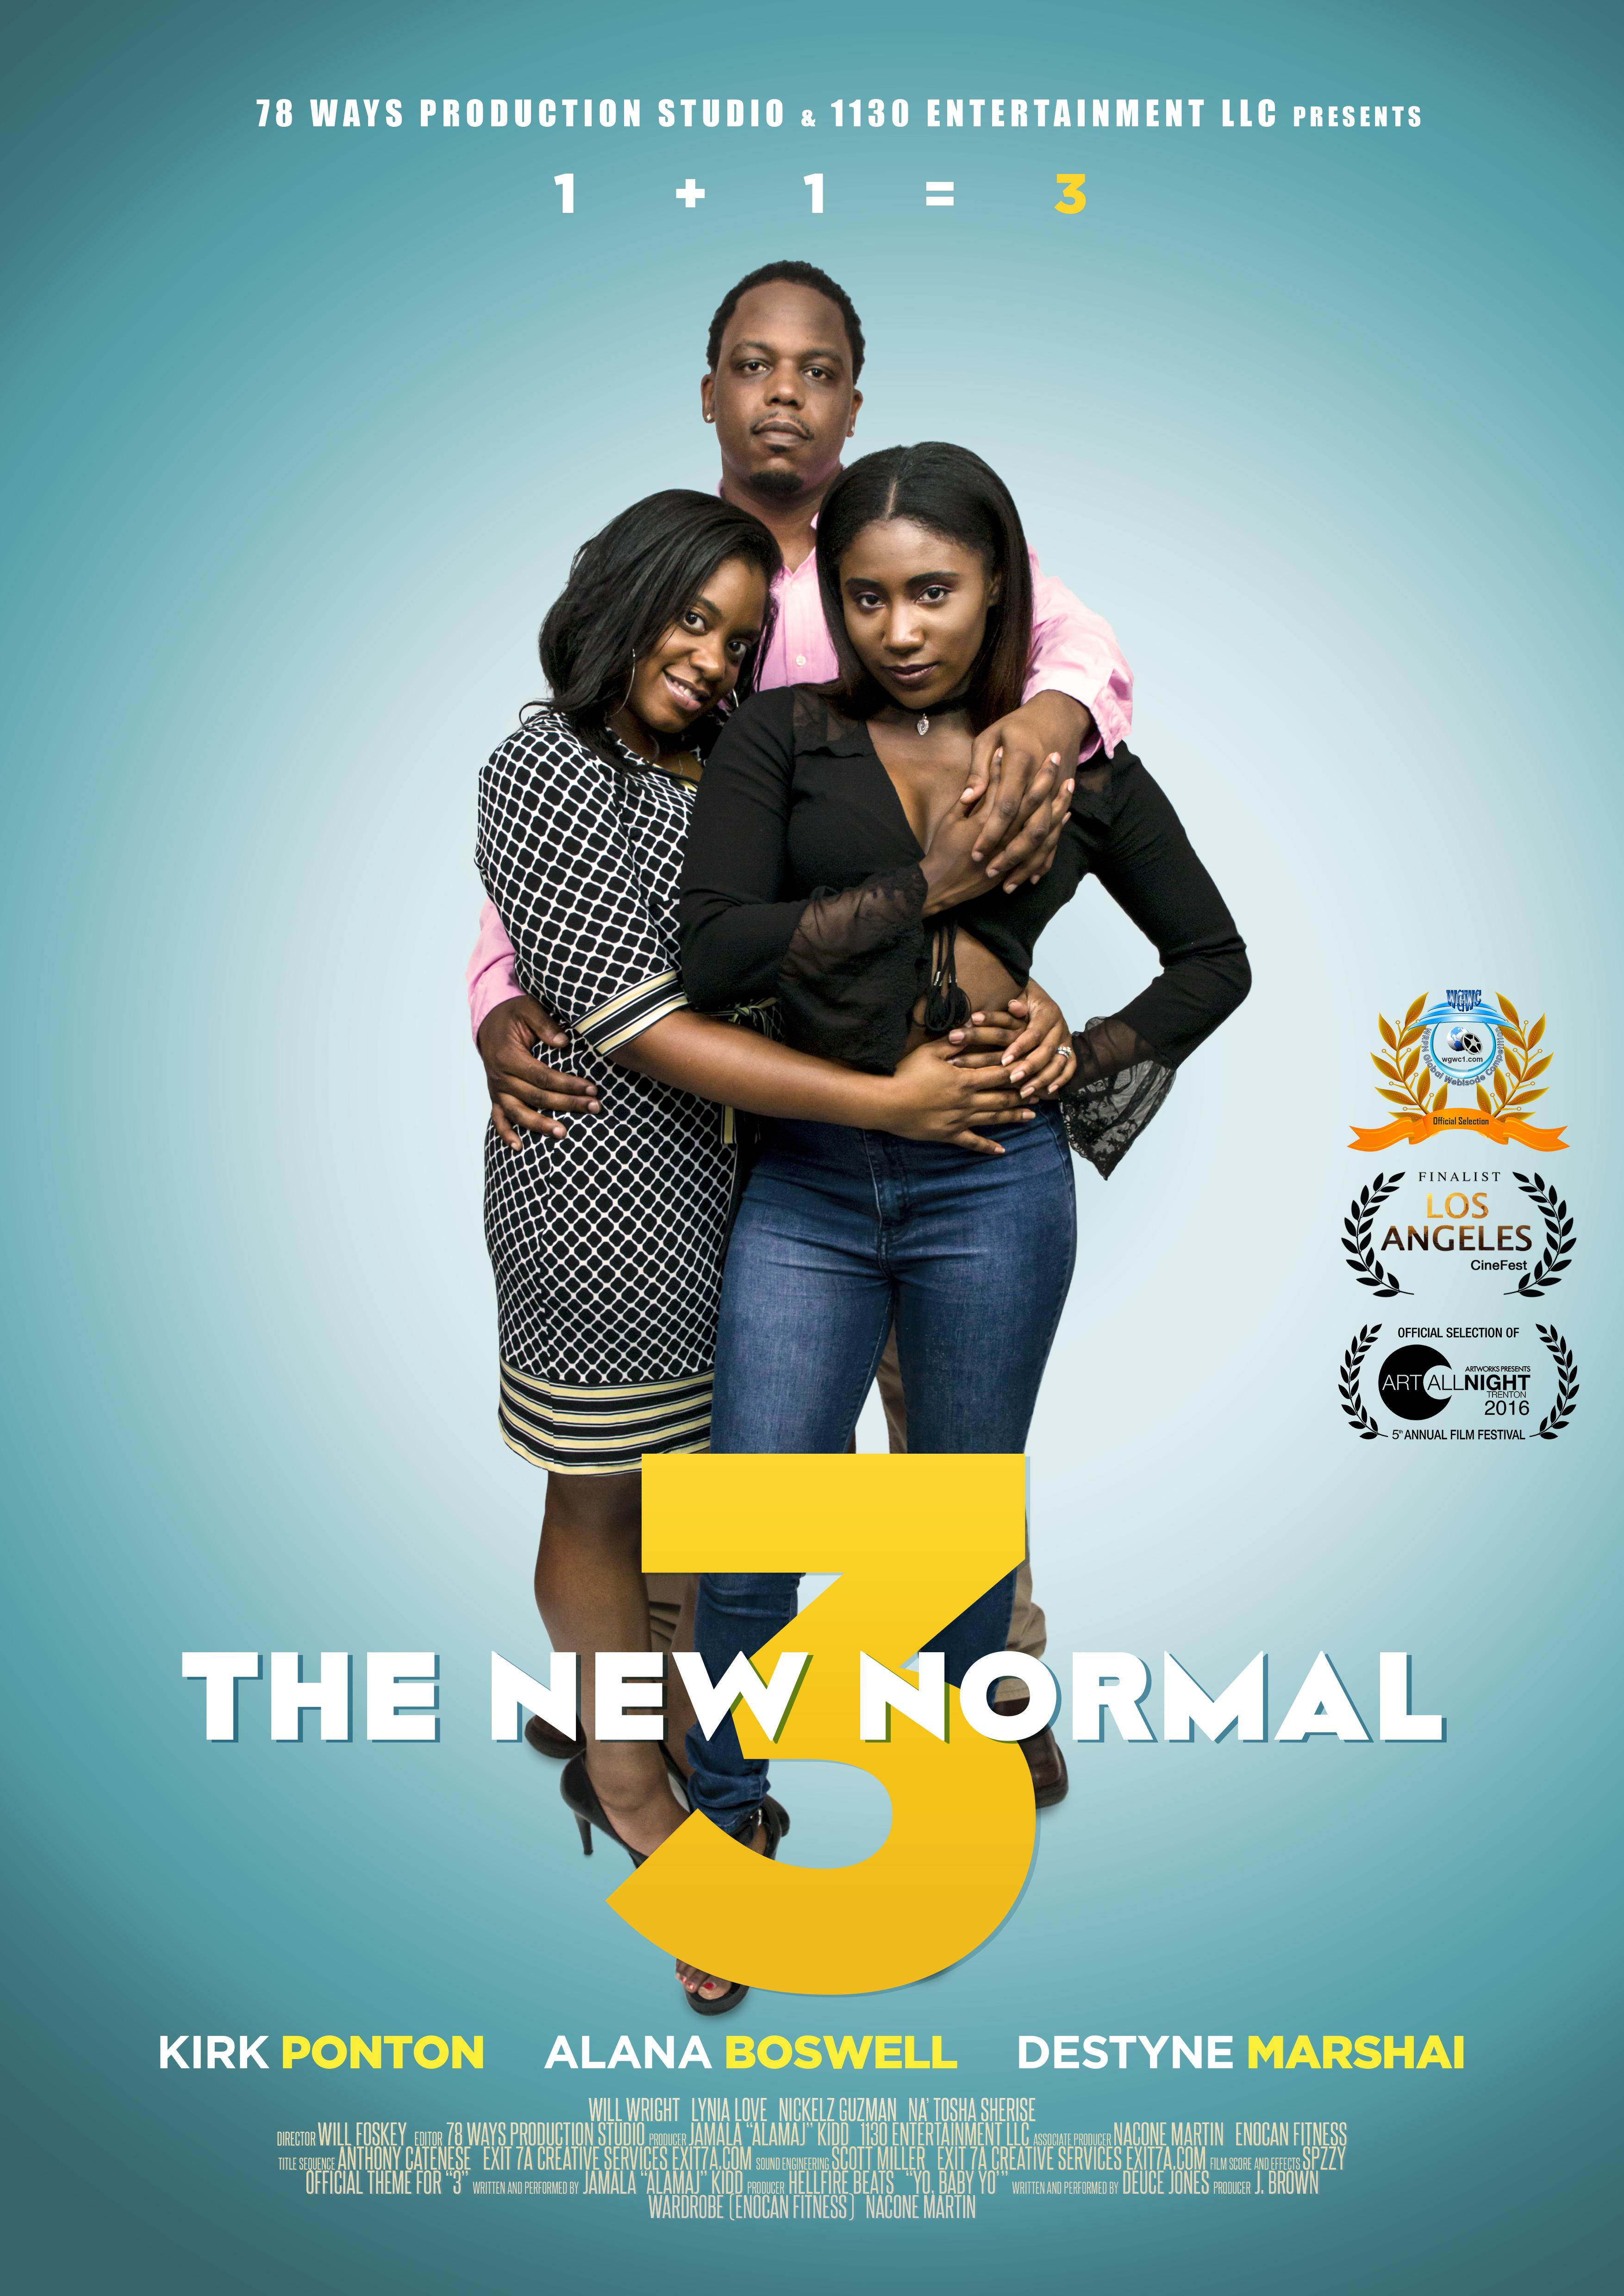 3 The New Normal 2016 Imdb